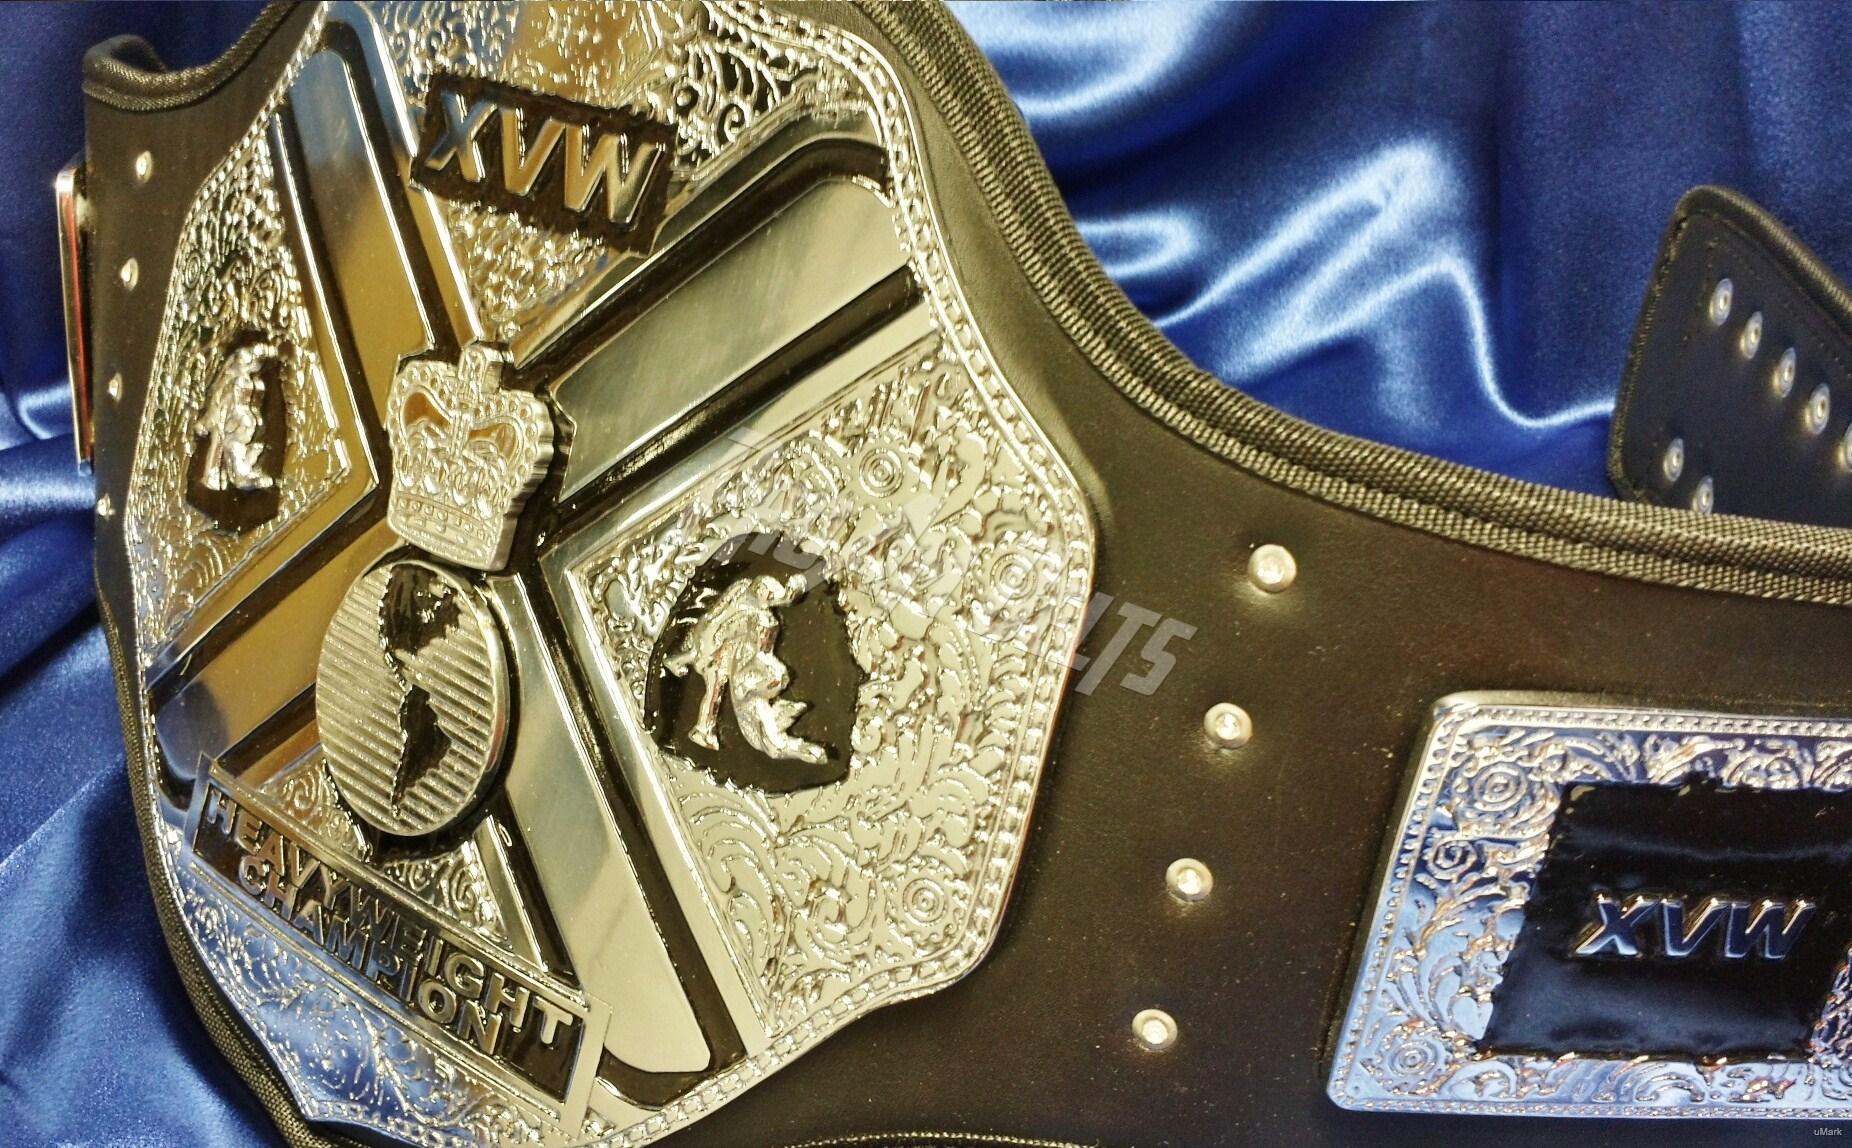 Nwa tag team wrestling champions belt buckle